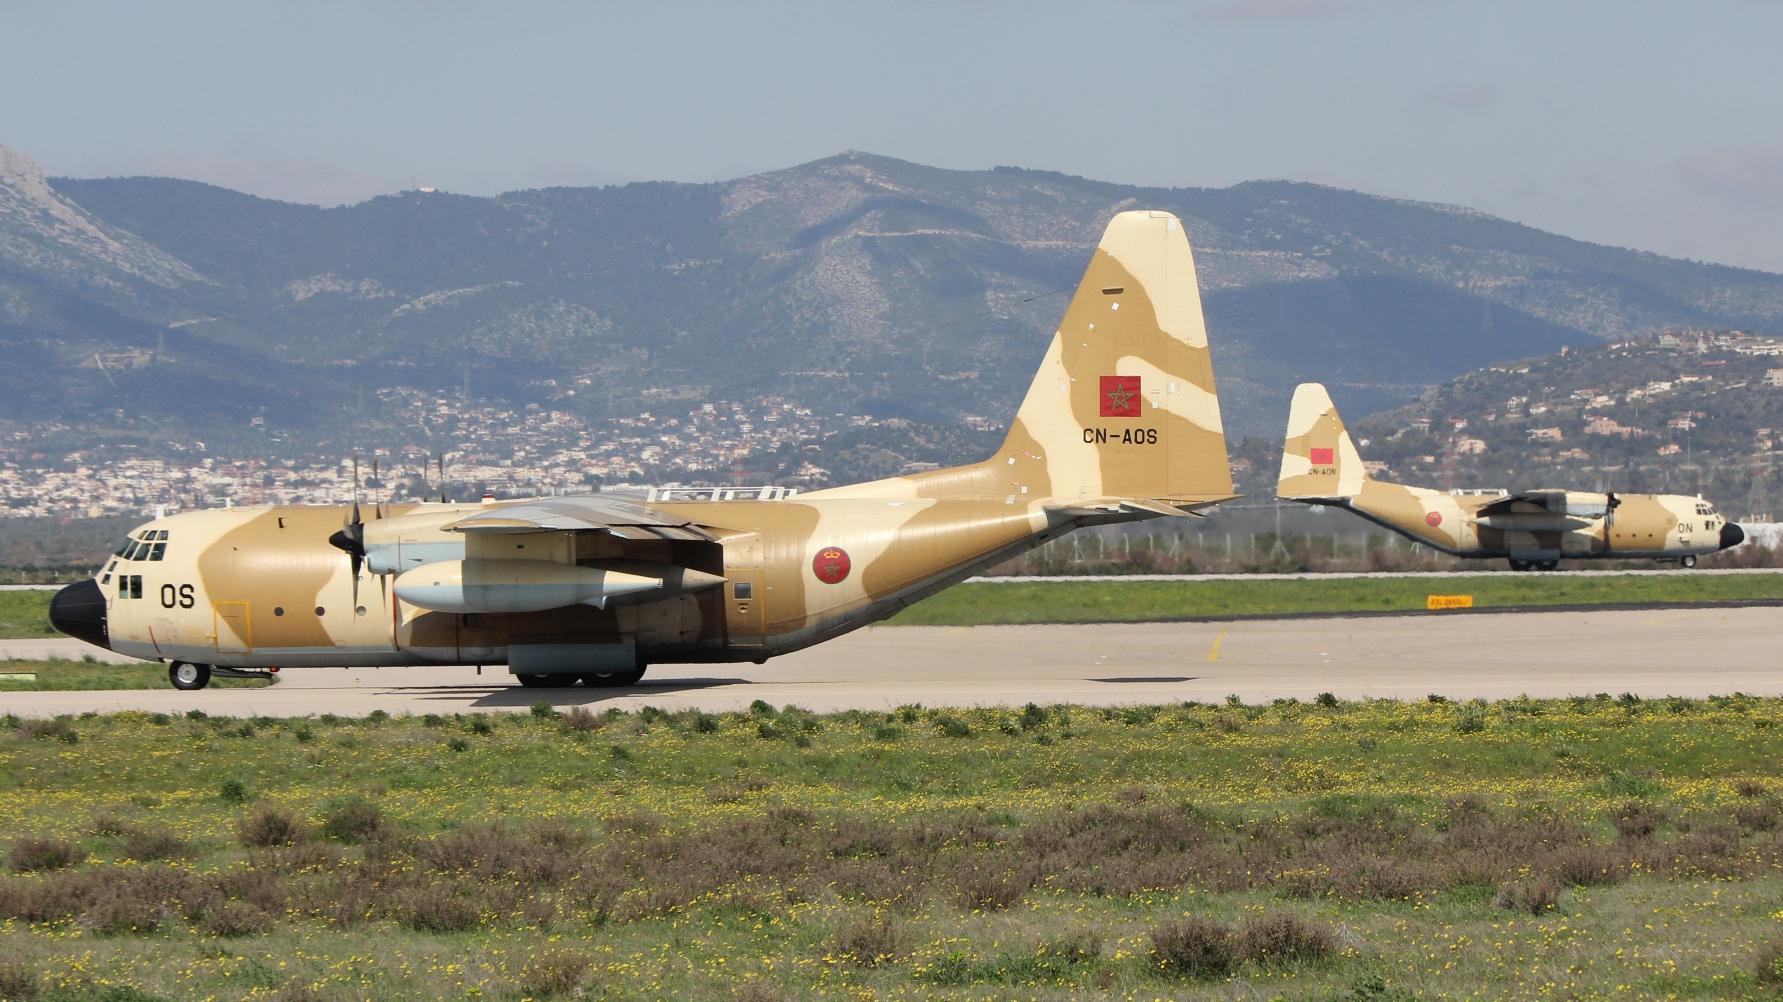 FRA: Photos d'avions de transport - Page 31 33577793411_412c595b04_o